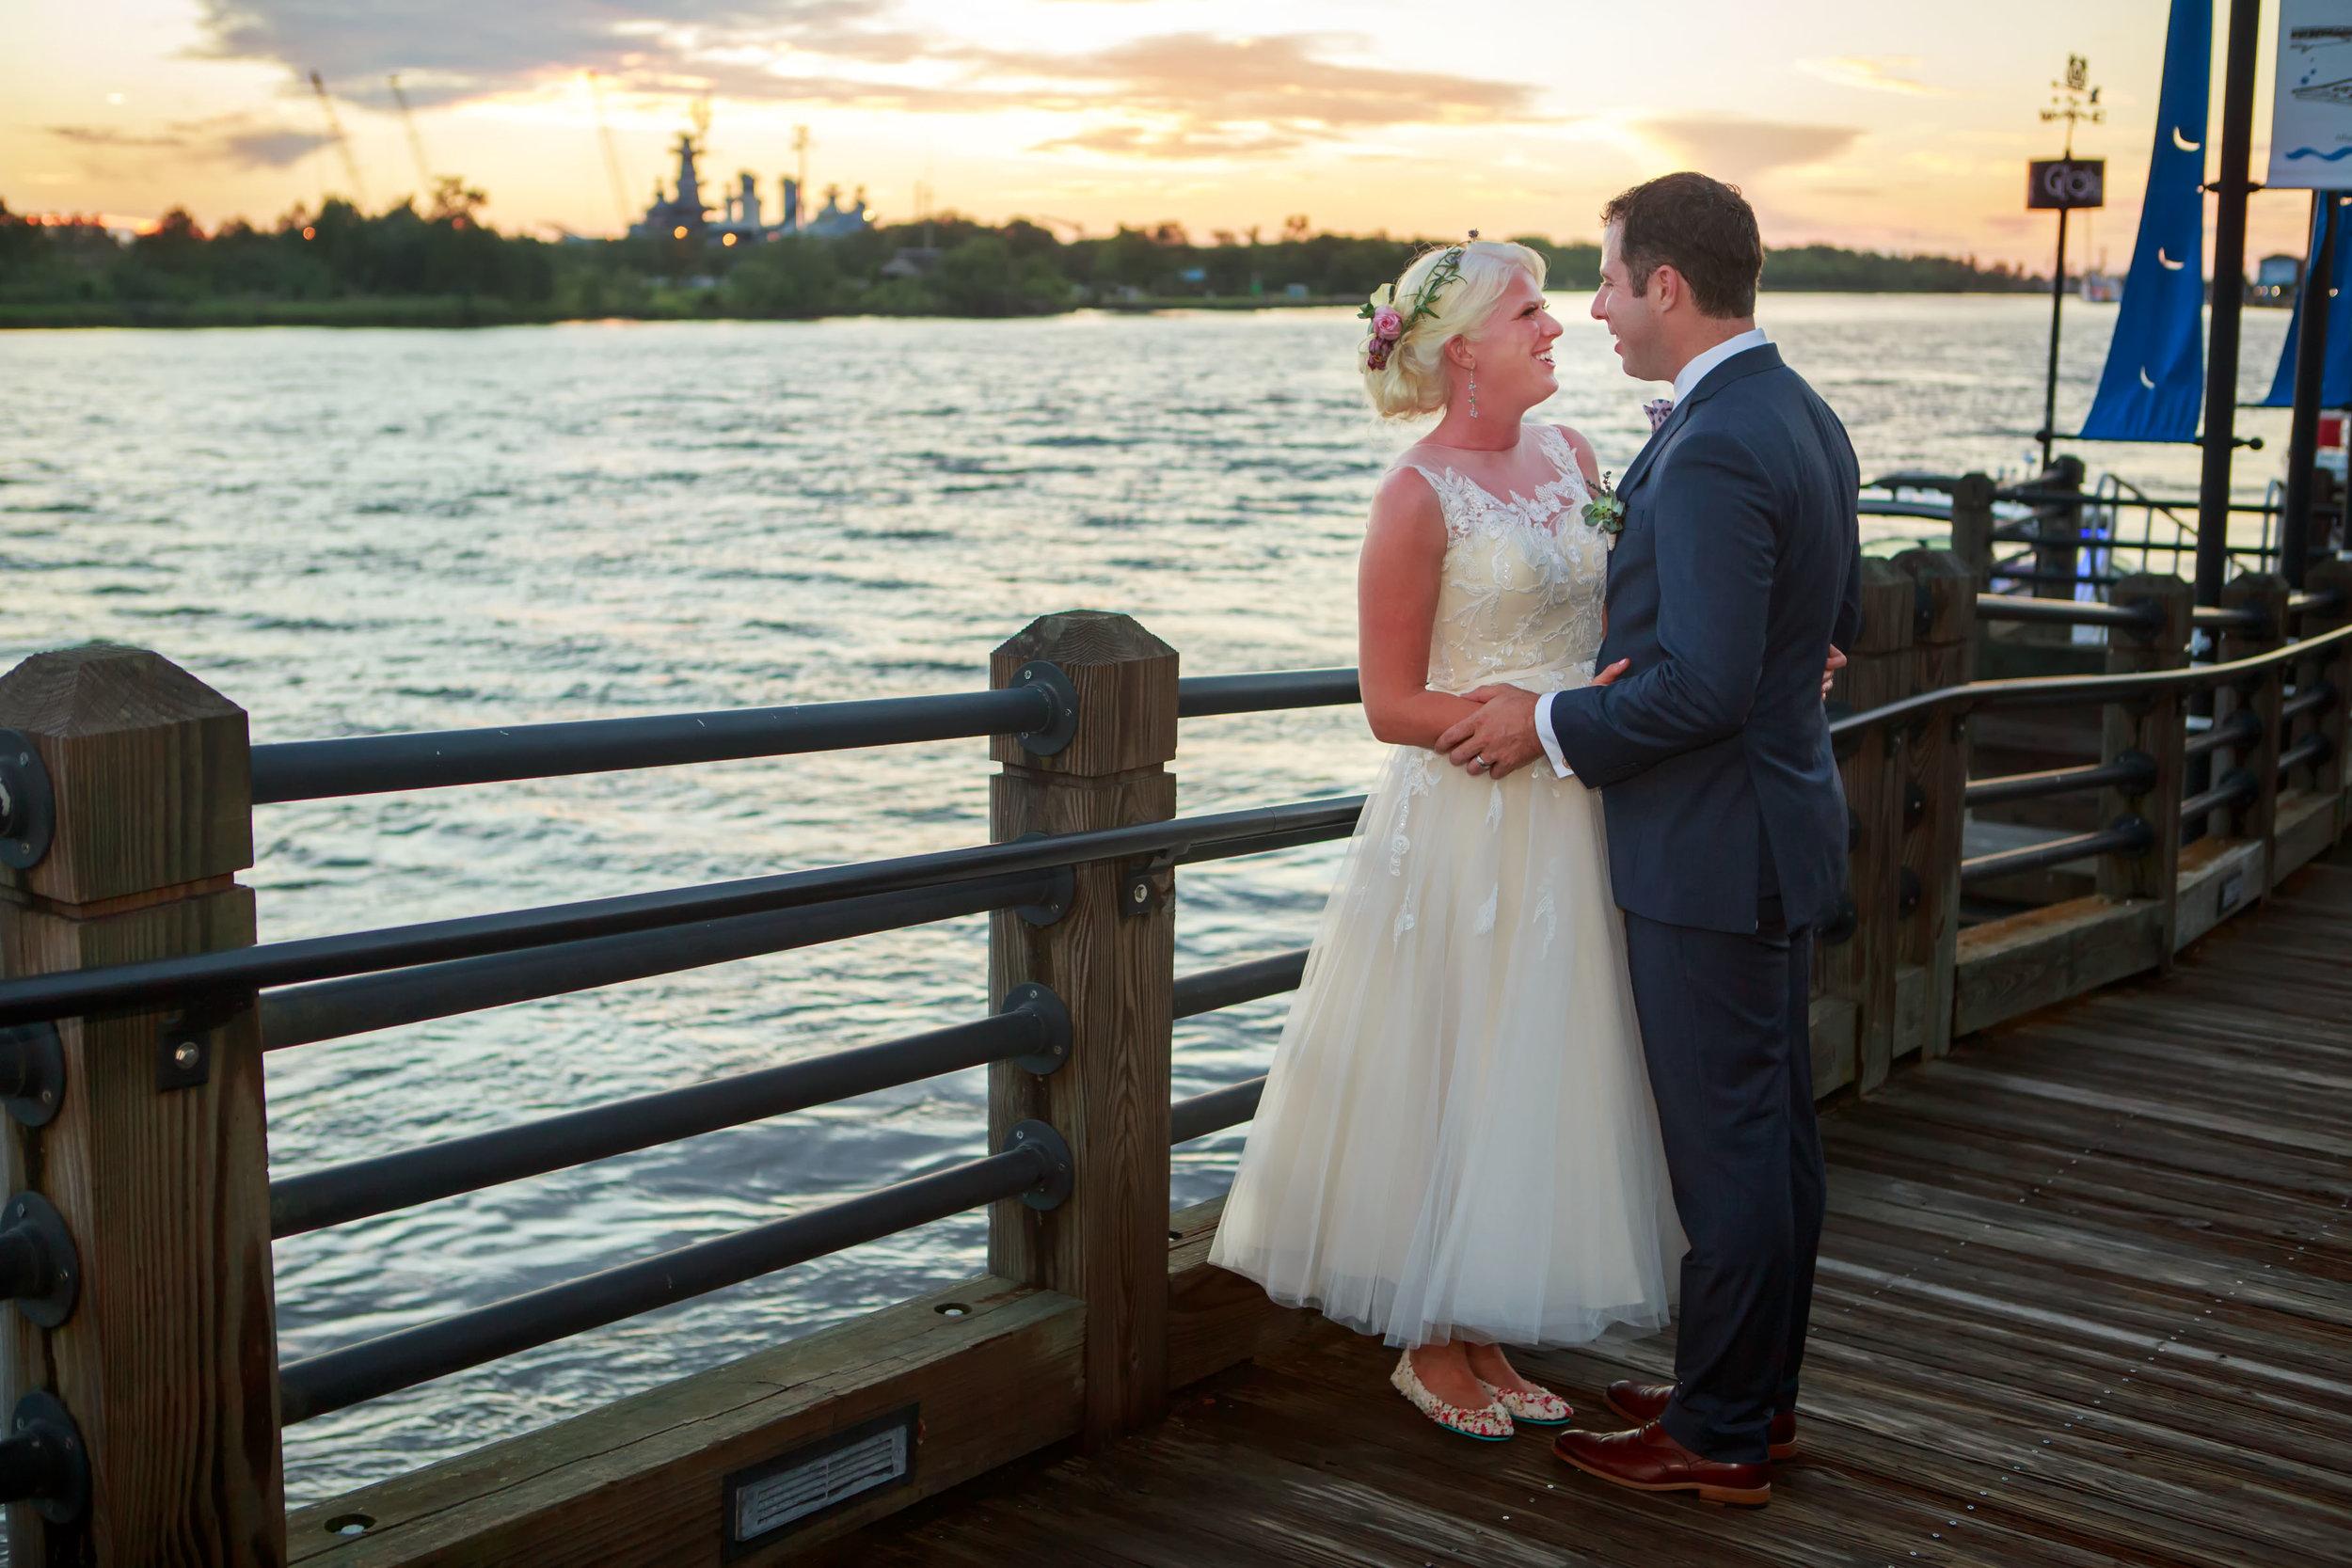 128-South-Wedding-Tiffany-Abruzzo-Photography-Bride-&-Groom-54.jpg